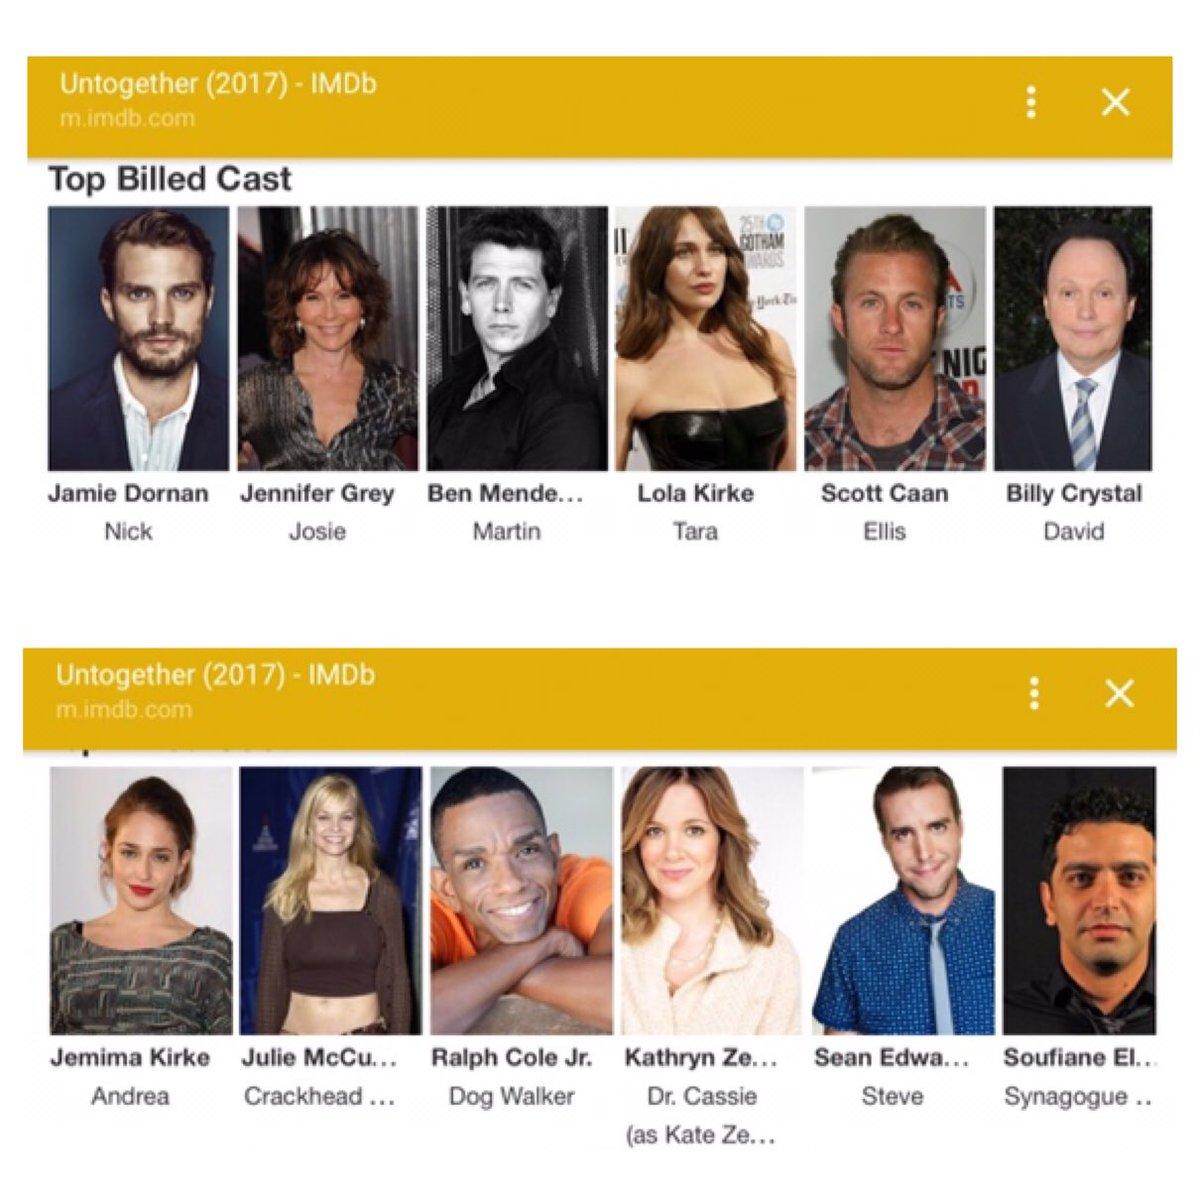 "JamieDornanLondon on Twitter: ""The cast of #Untogether movie 😊 #JamieDornan https://t.co/3bWtADxmI7"""